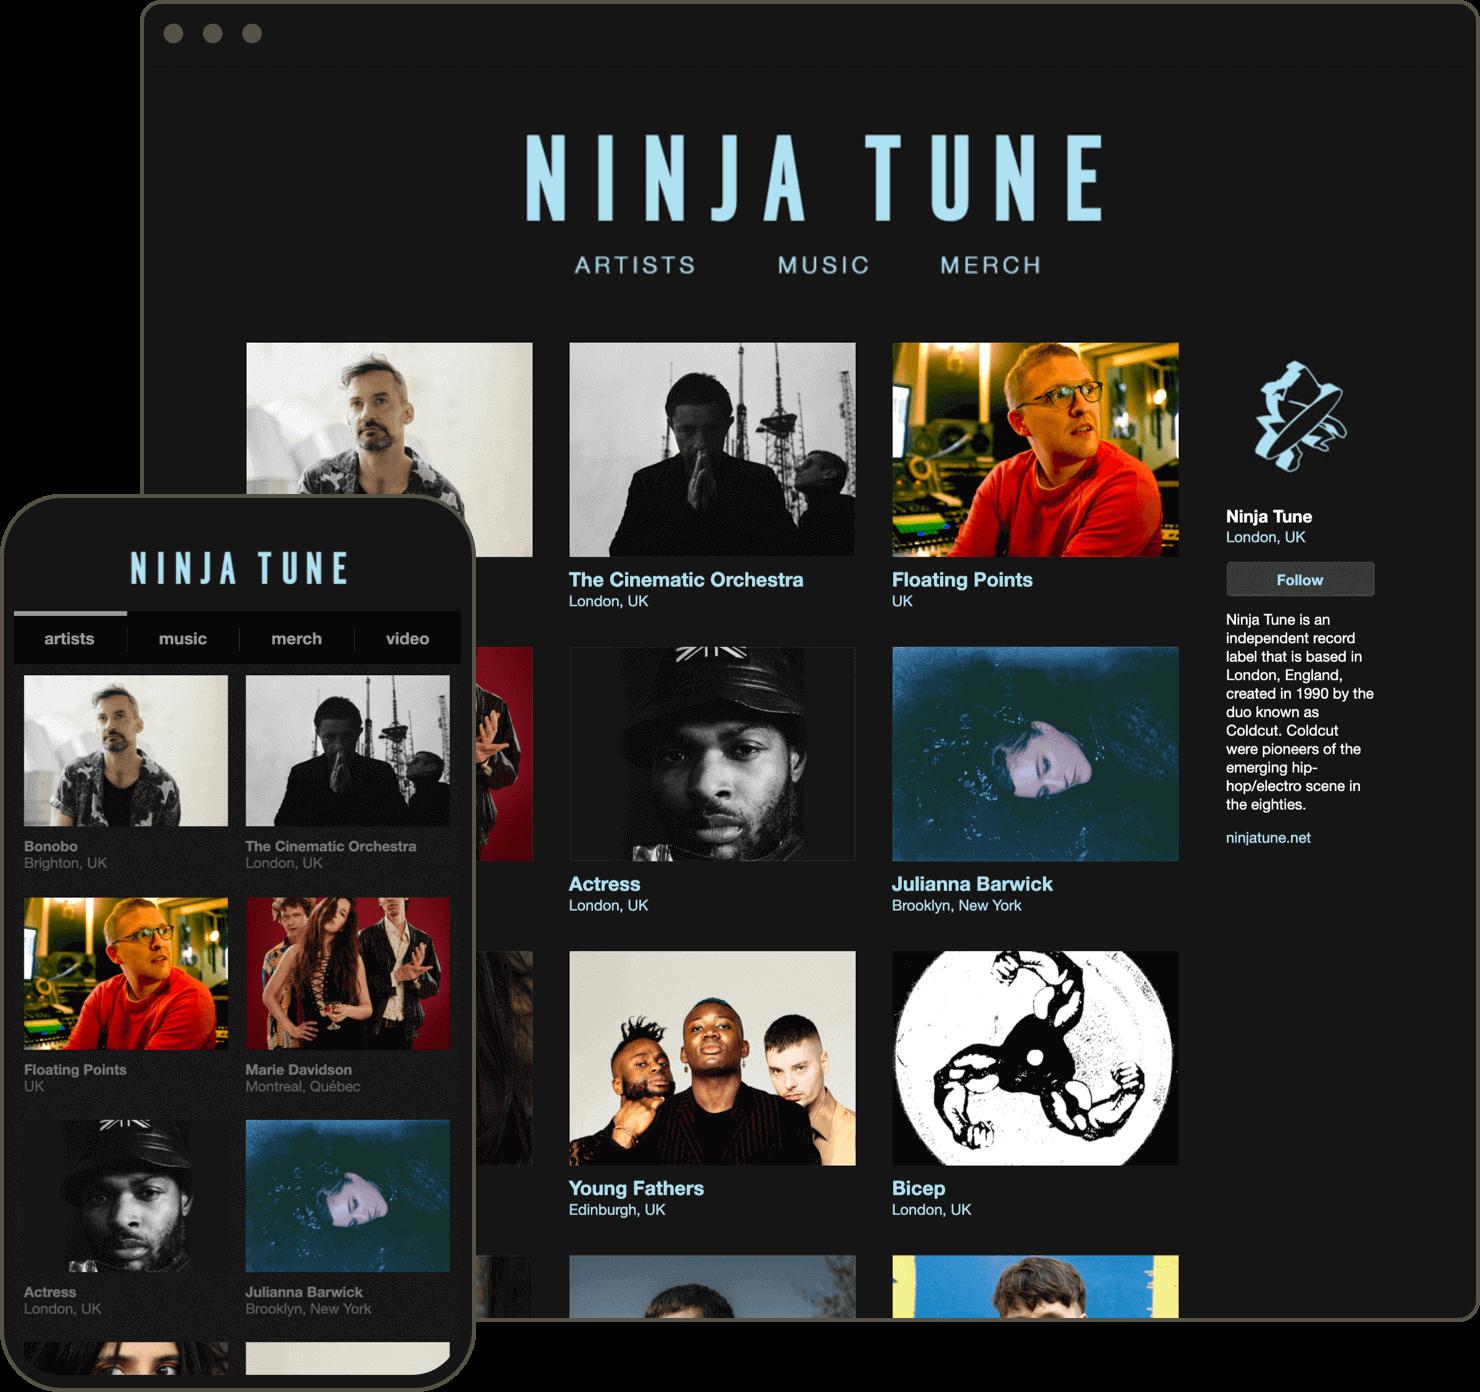 A screenshot of Ninja Tune's Bandcamp page